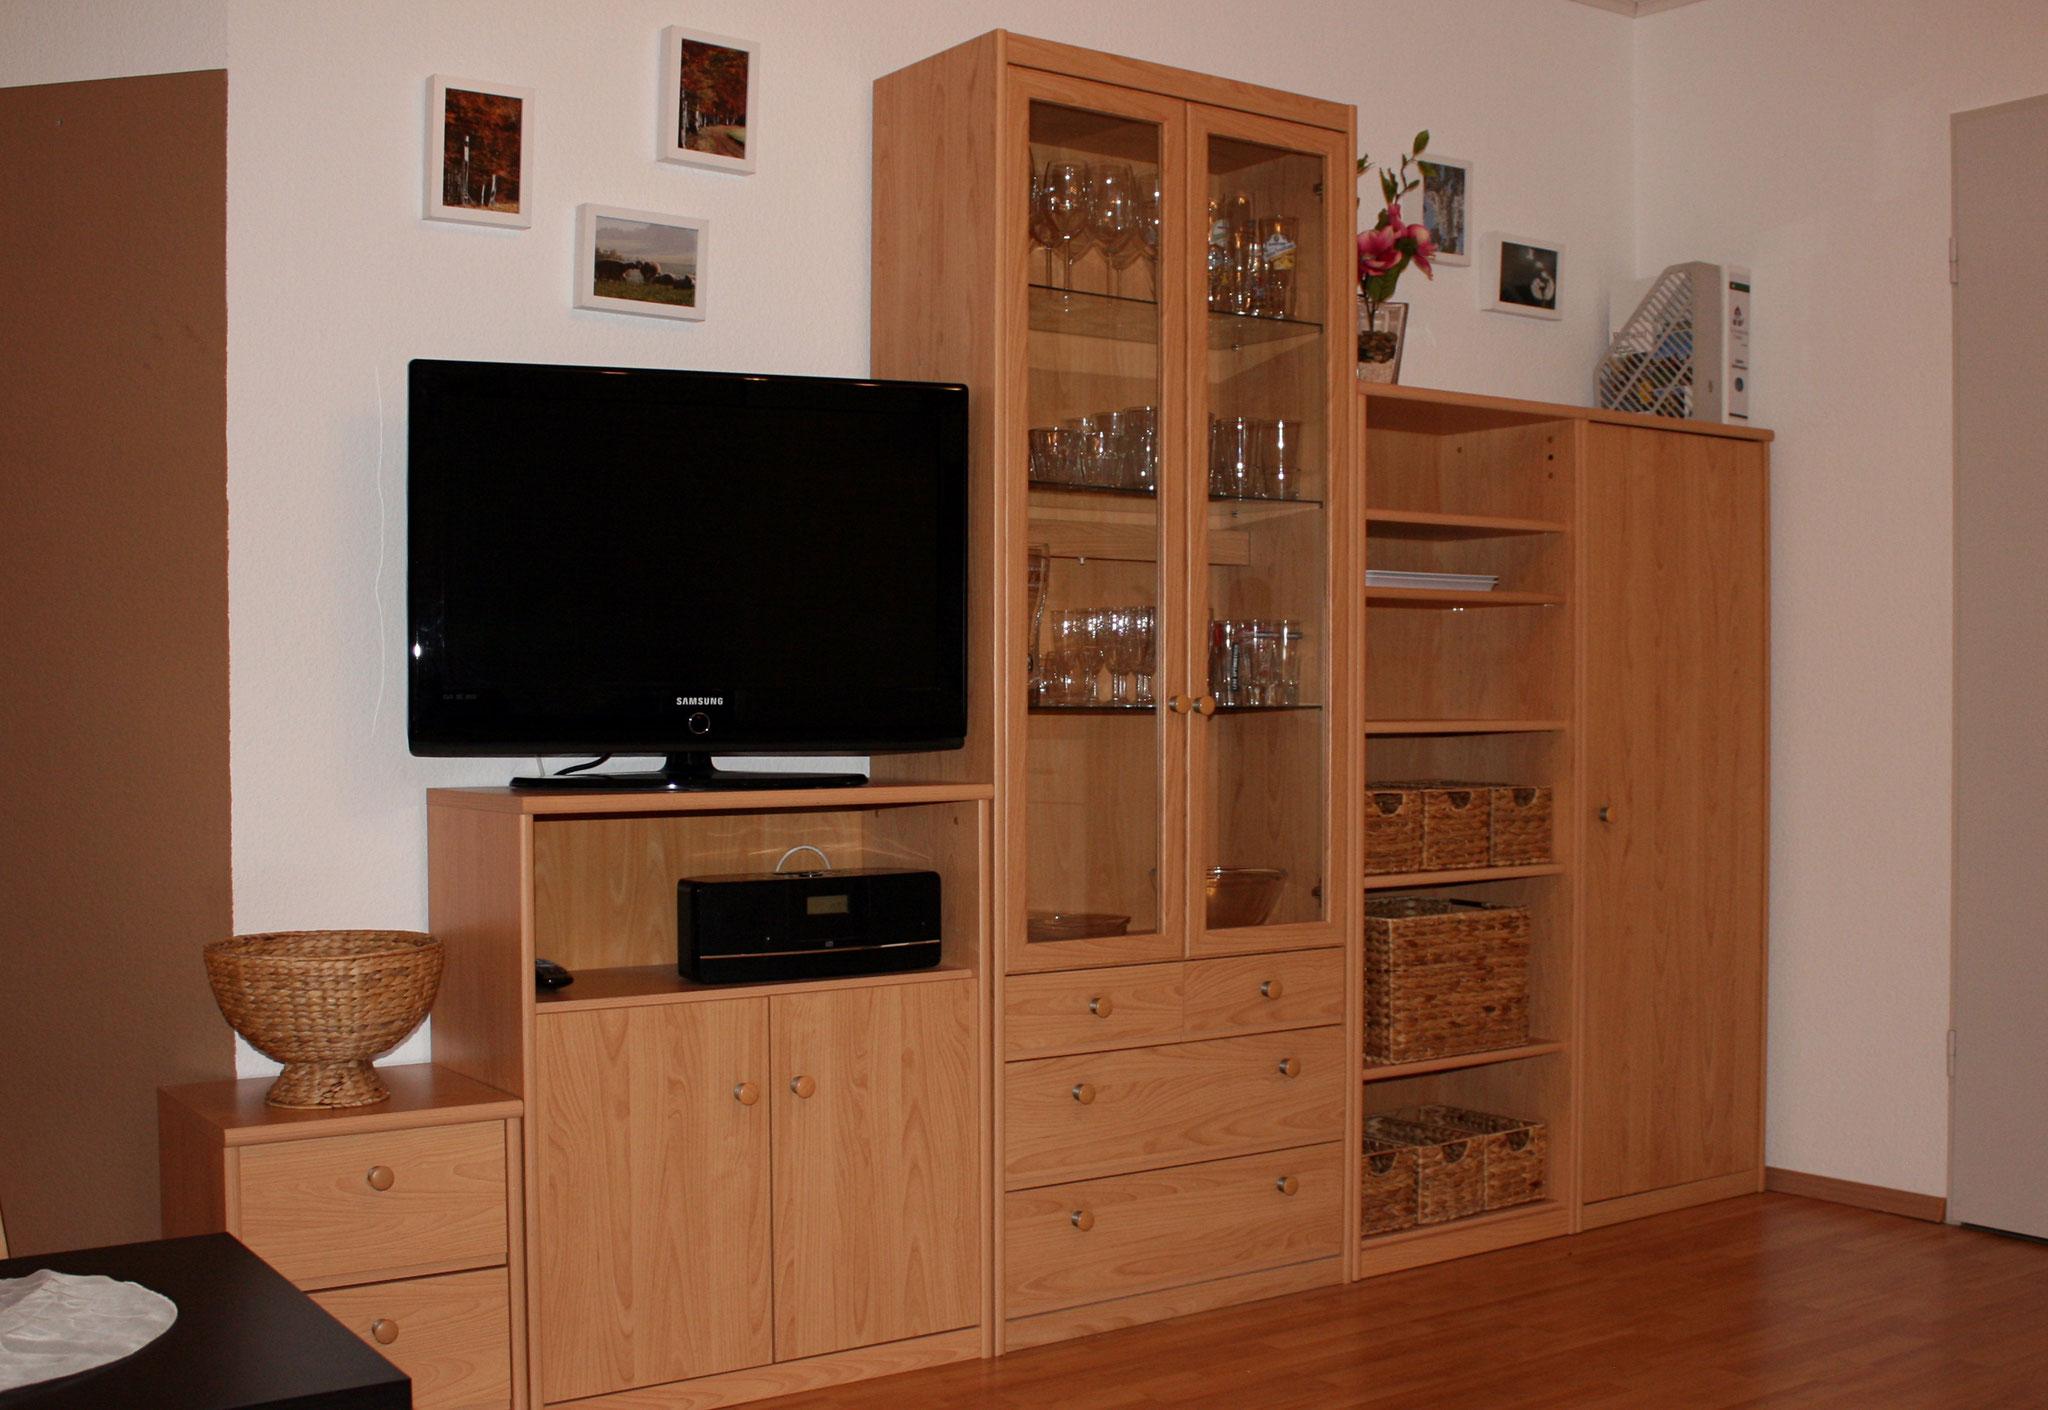 TV / Radio / Stauraum